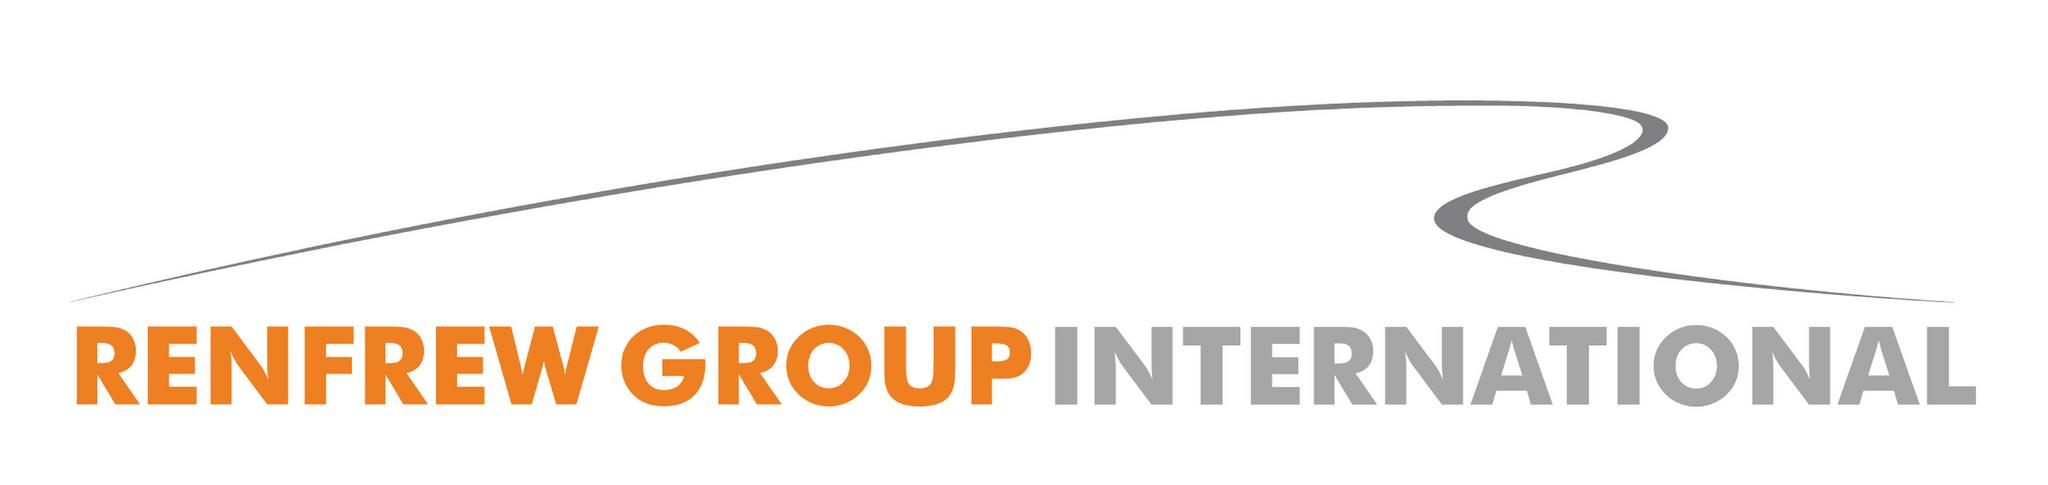 Renfrew Group